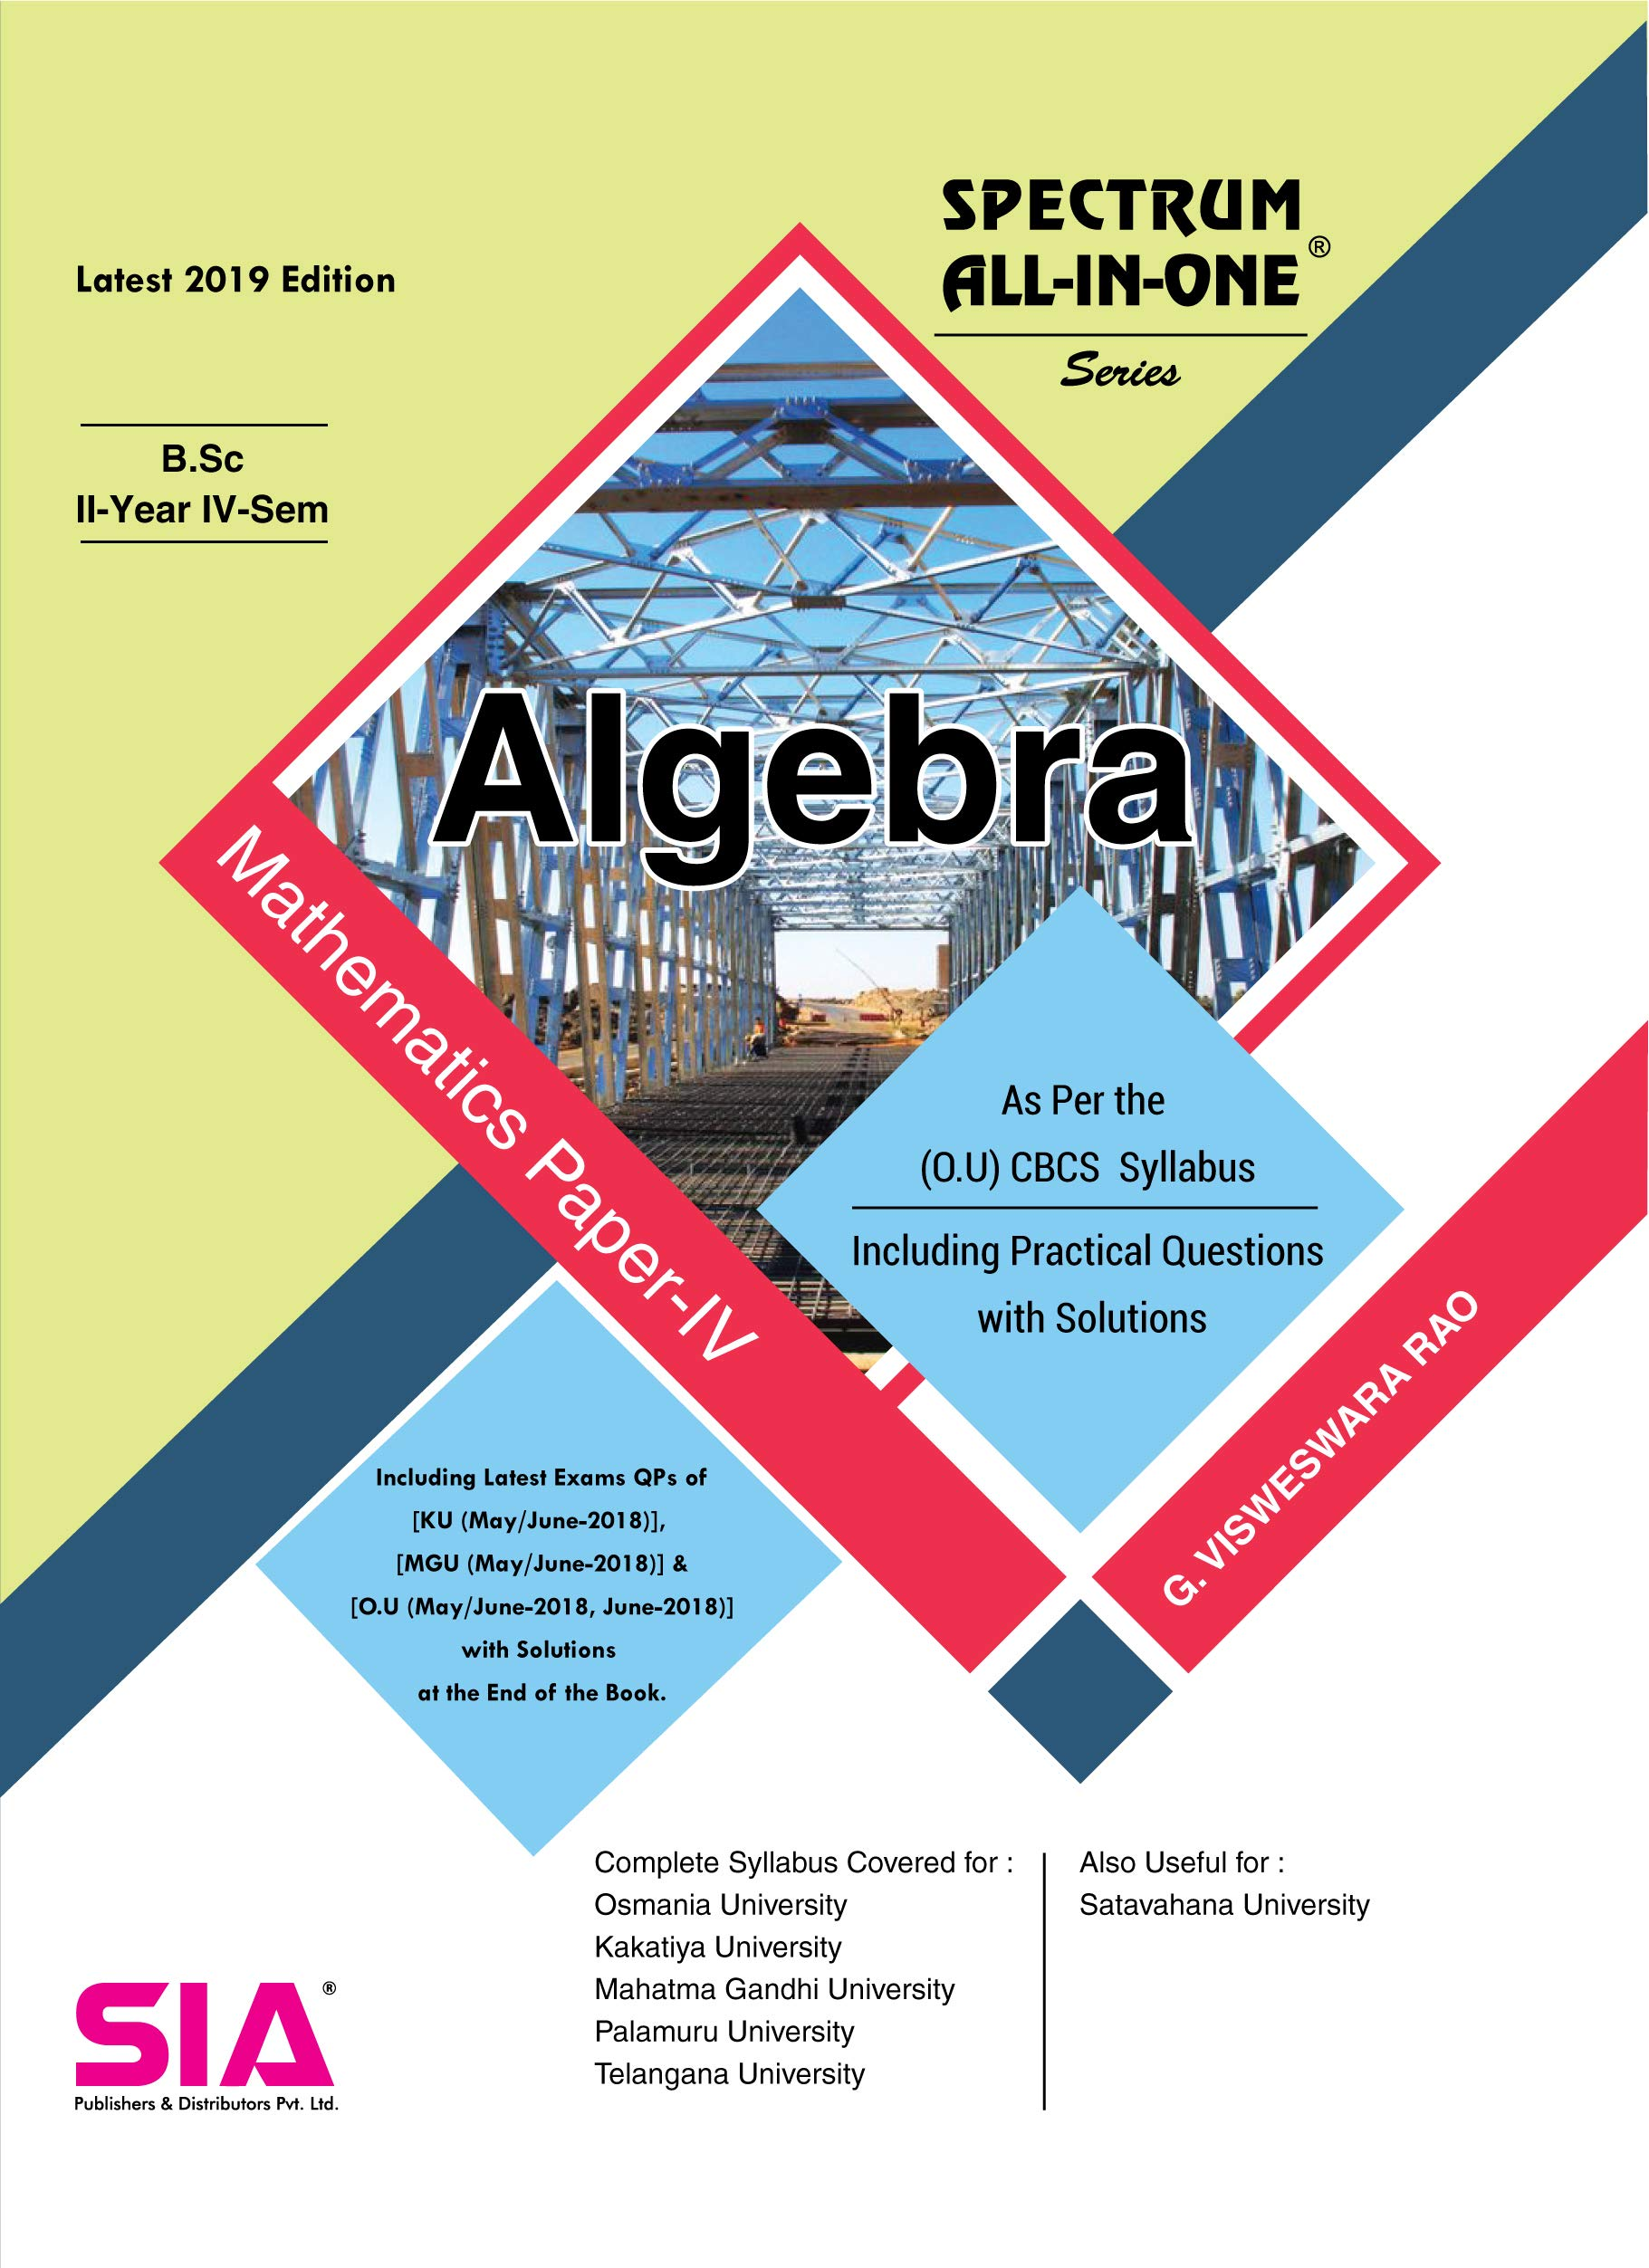 SIA Publishers arts-and-science-bsc-kakatiya-university-IIyear-IVsem